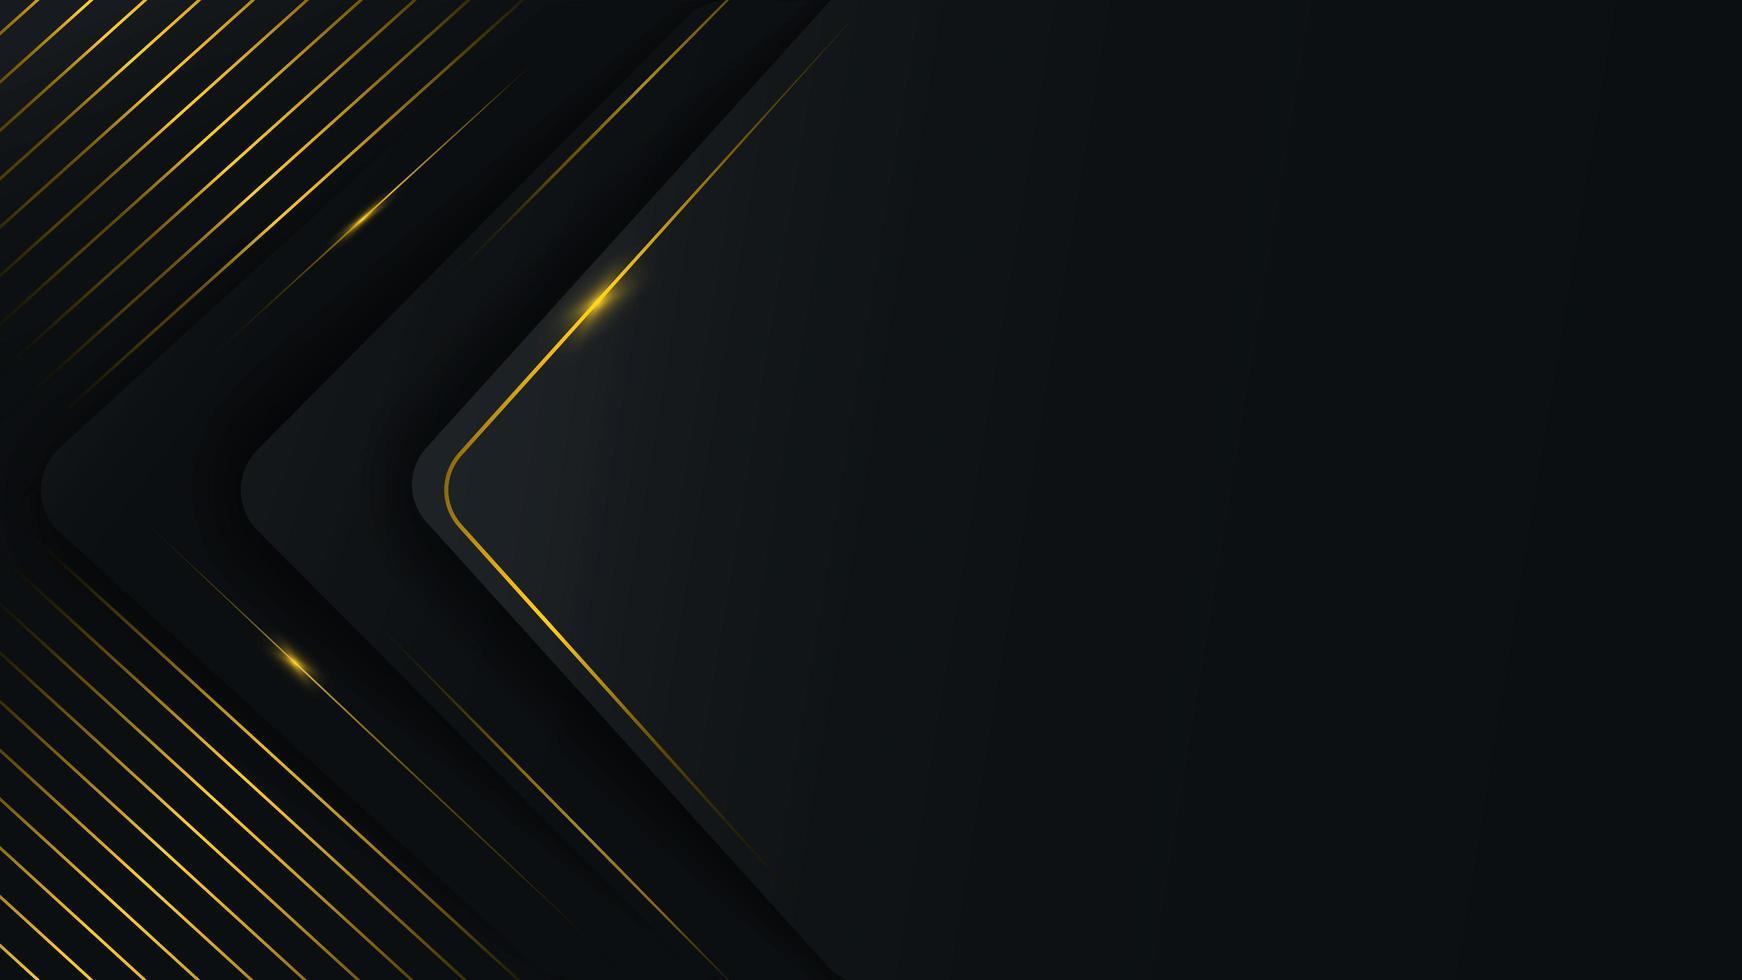 abstrakta rundade triangellager med gyllene linjer vektor